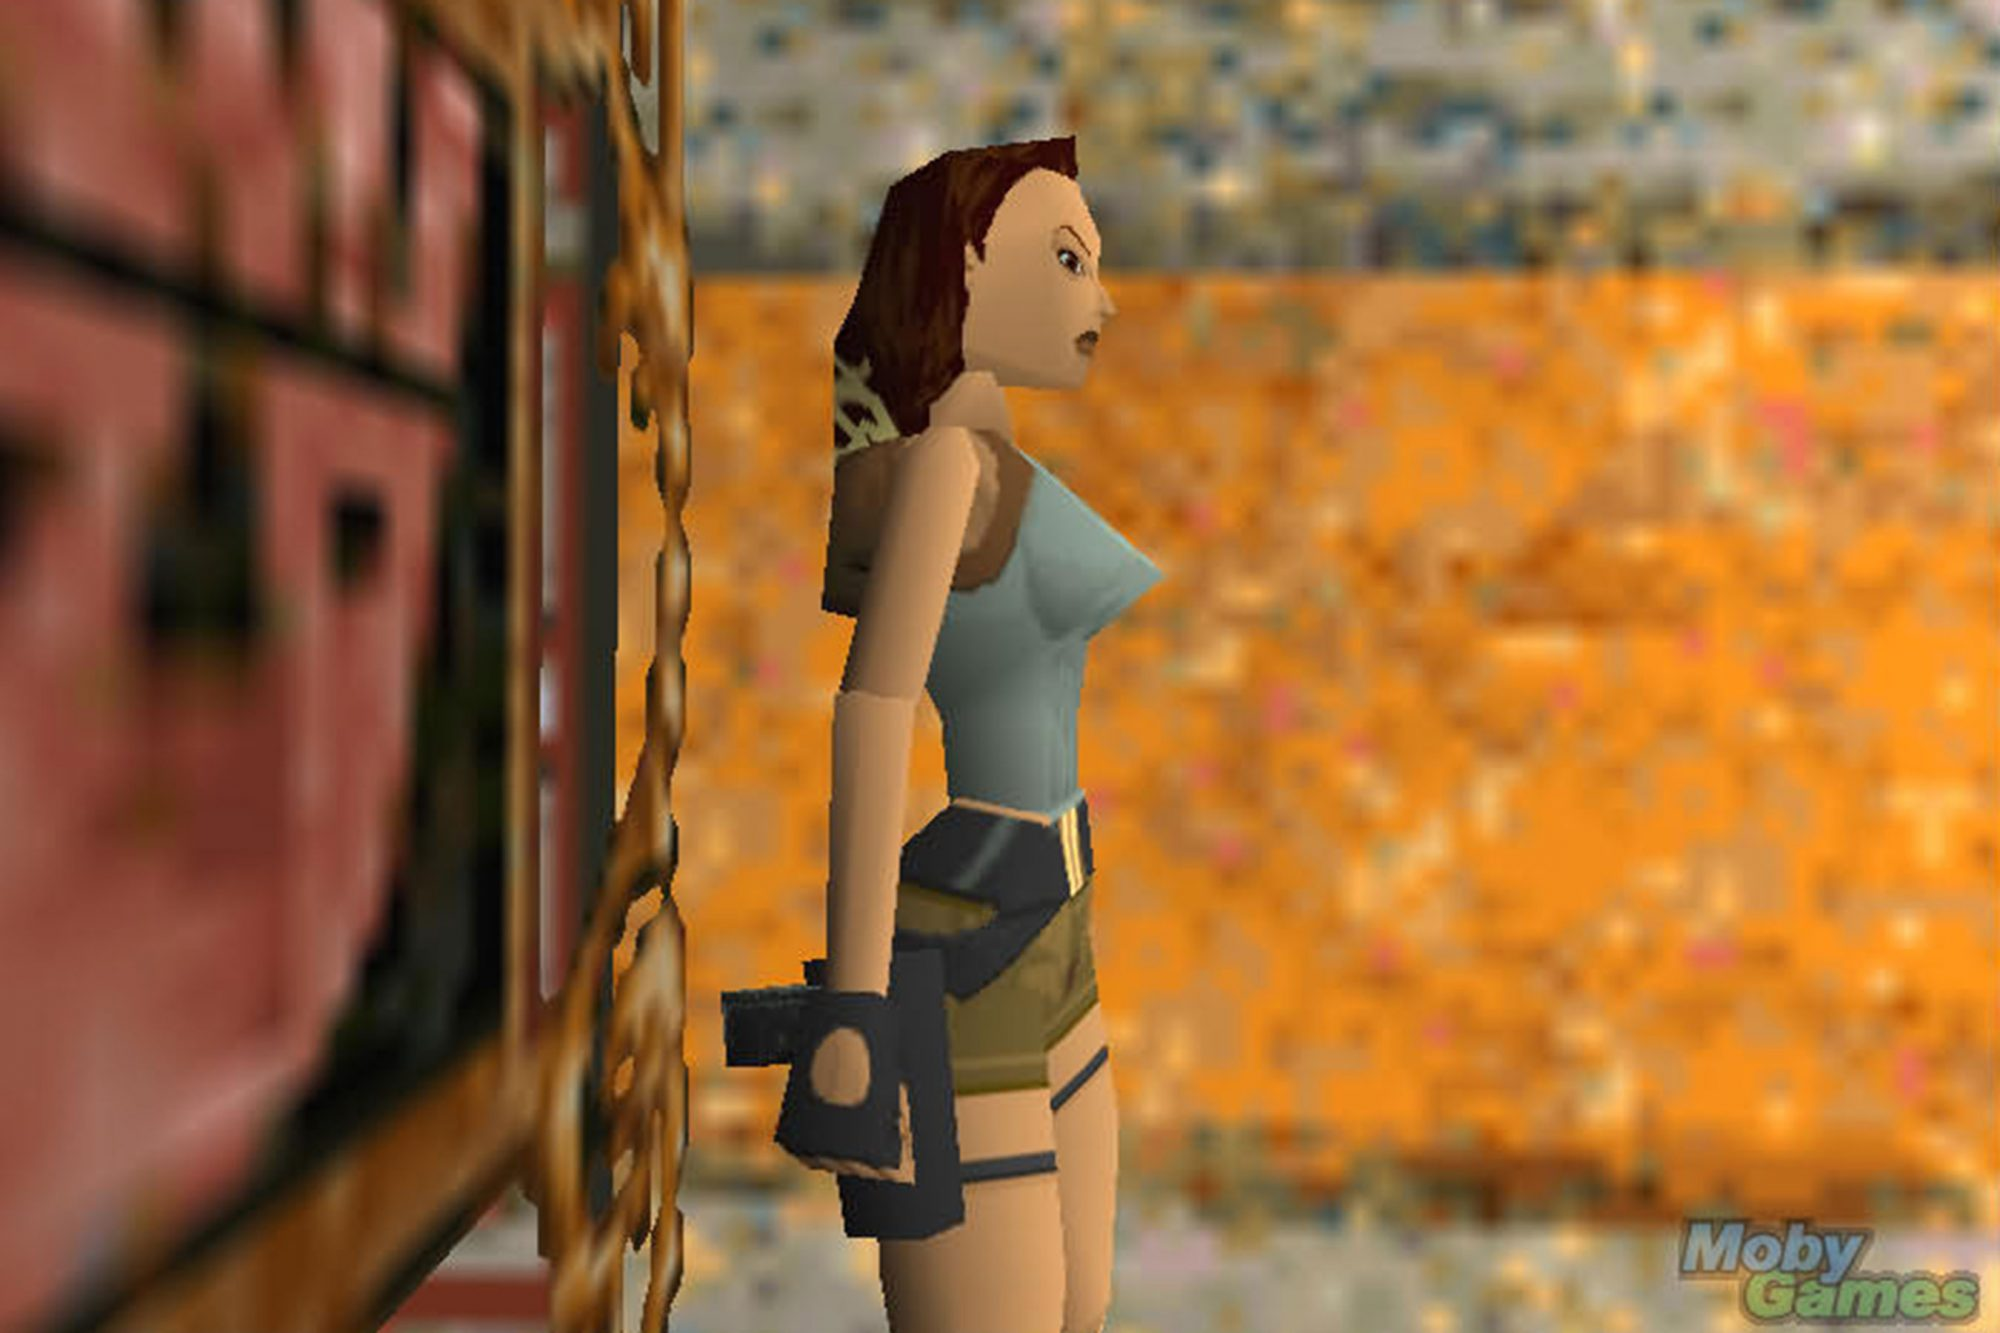 Tomb Raider(video game) - 1996Original game